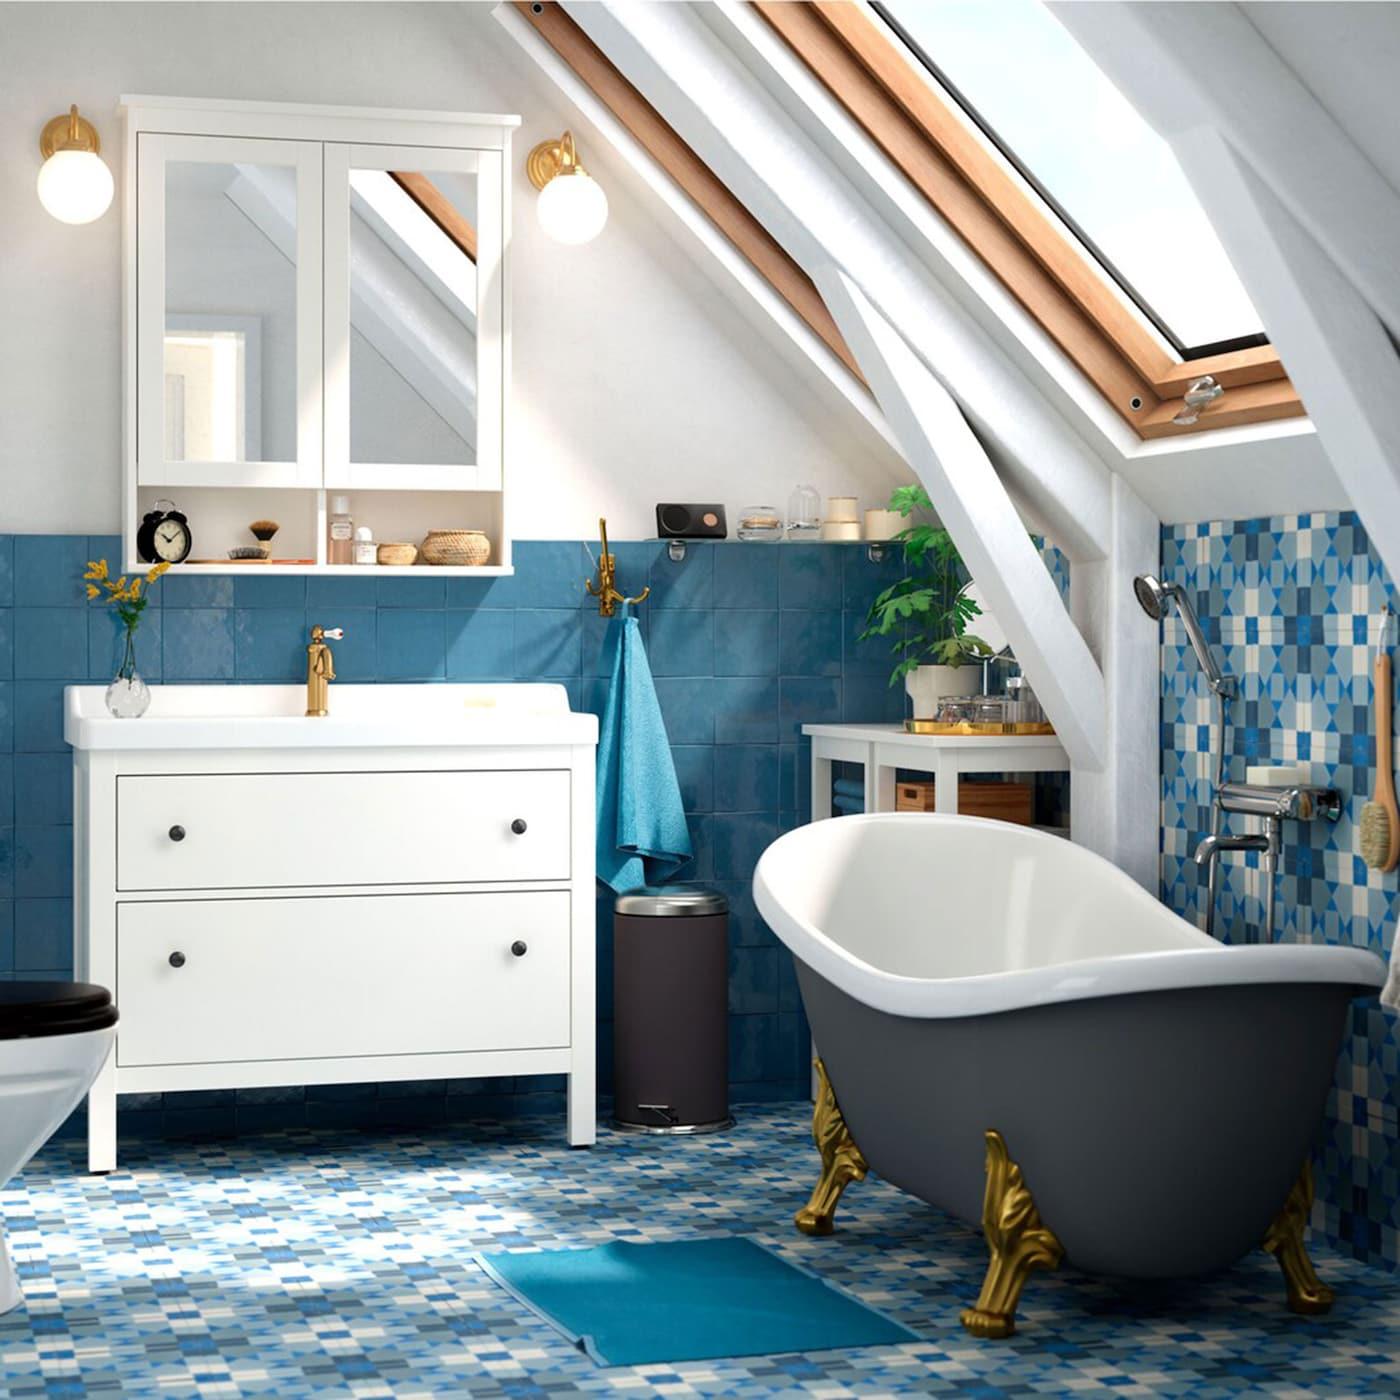 Furnishing ideas & inspiration for your bathroom - IKEA Switzerland